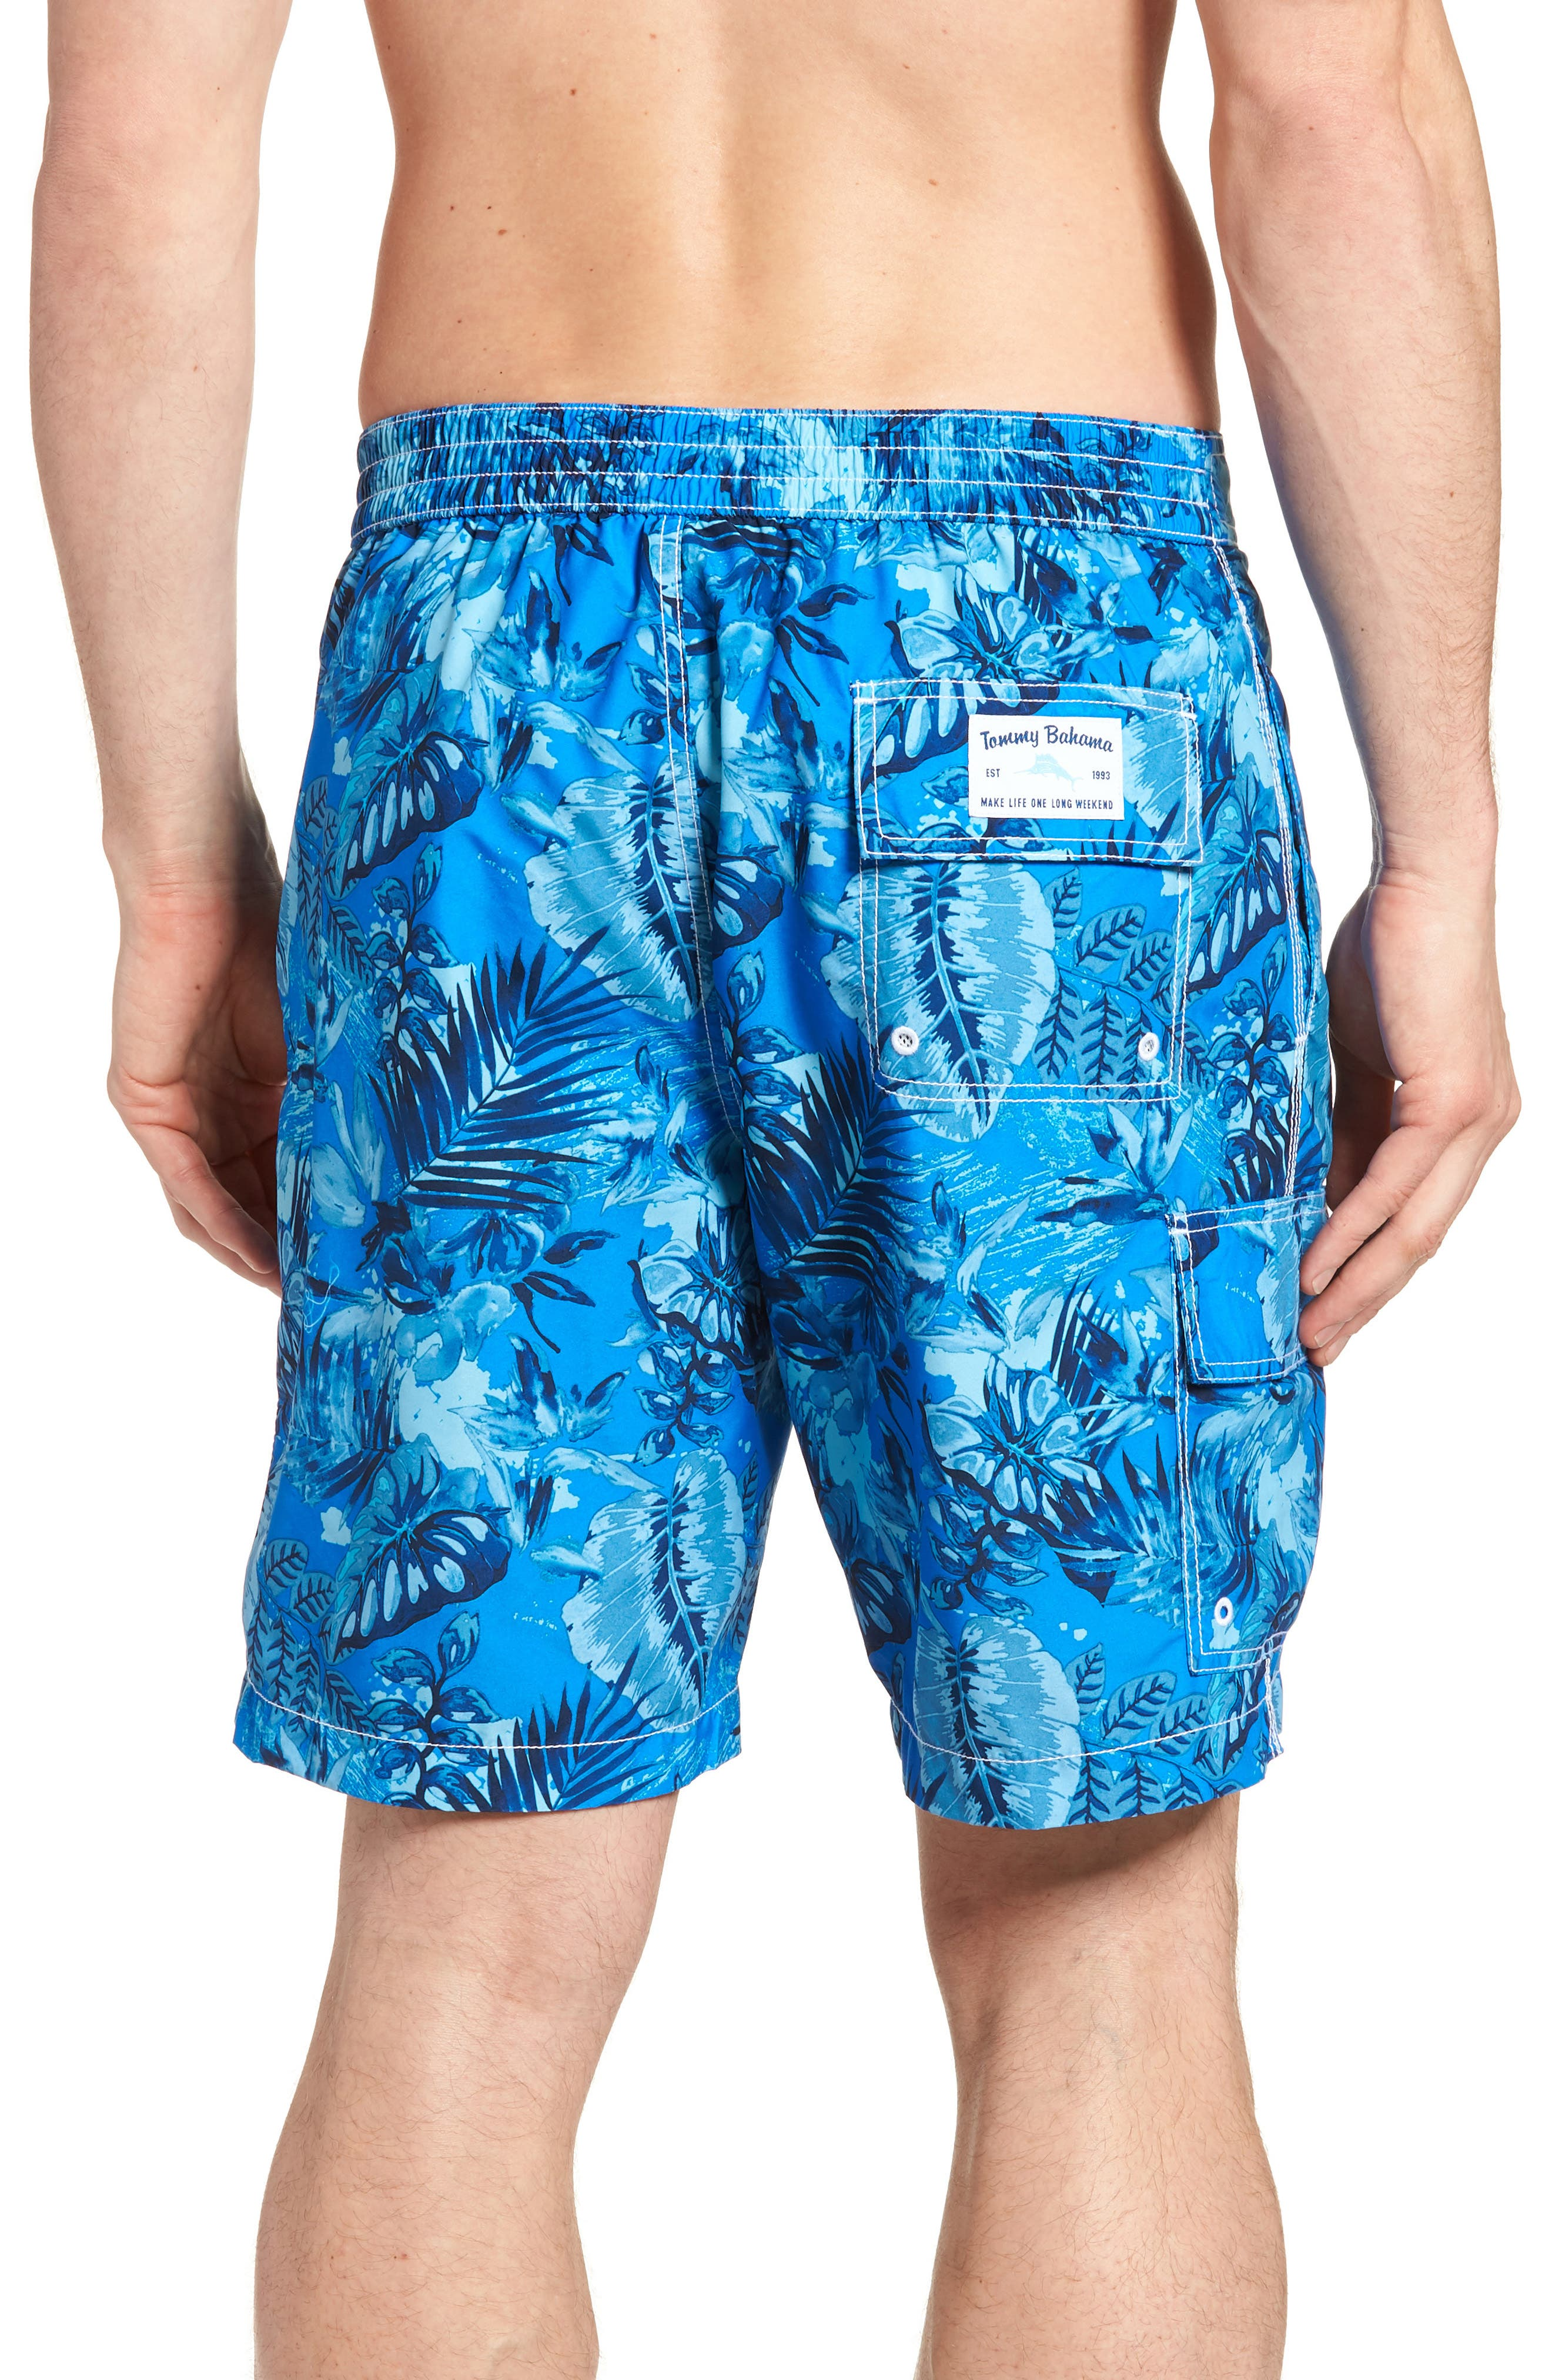 TOMMY BAHAMA,                             Baja Selva Shores Board Shorts,                             Alternate thumbnail 2, color,                             400